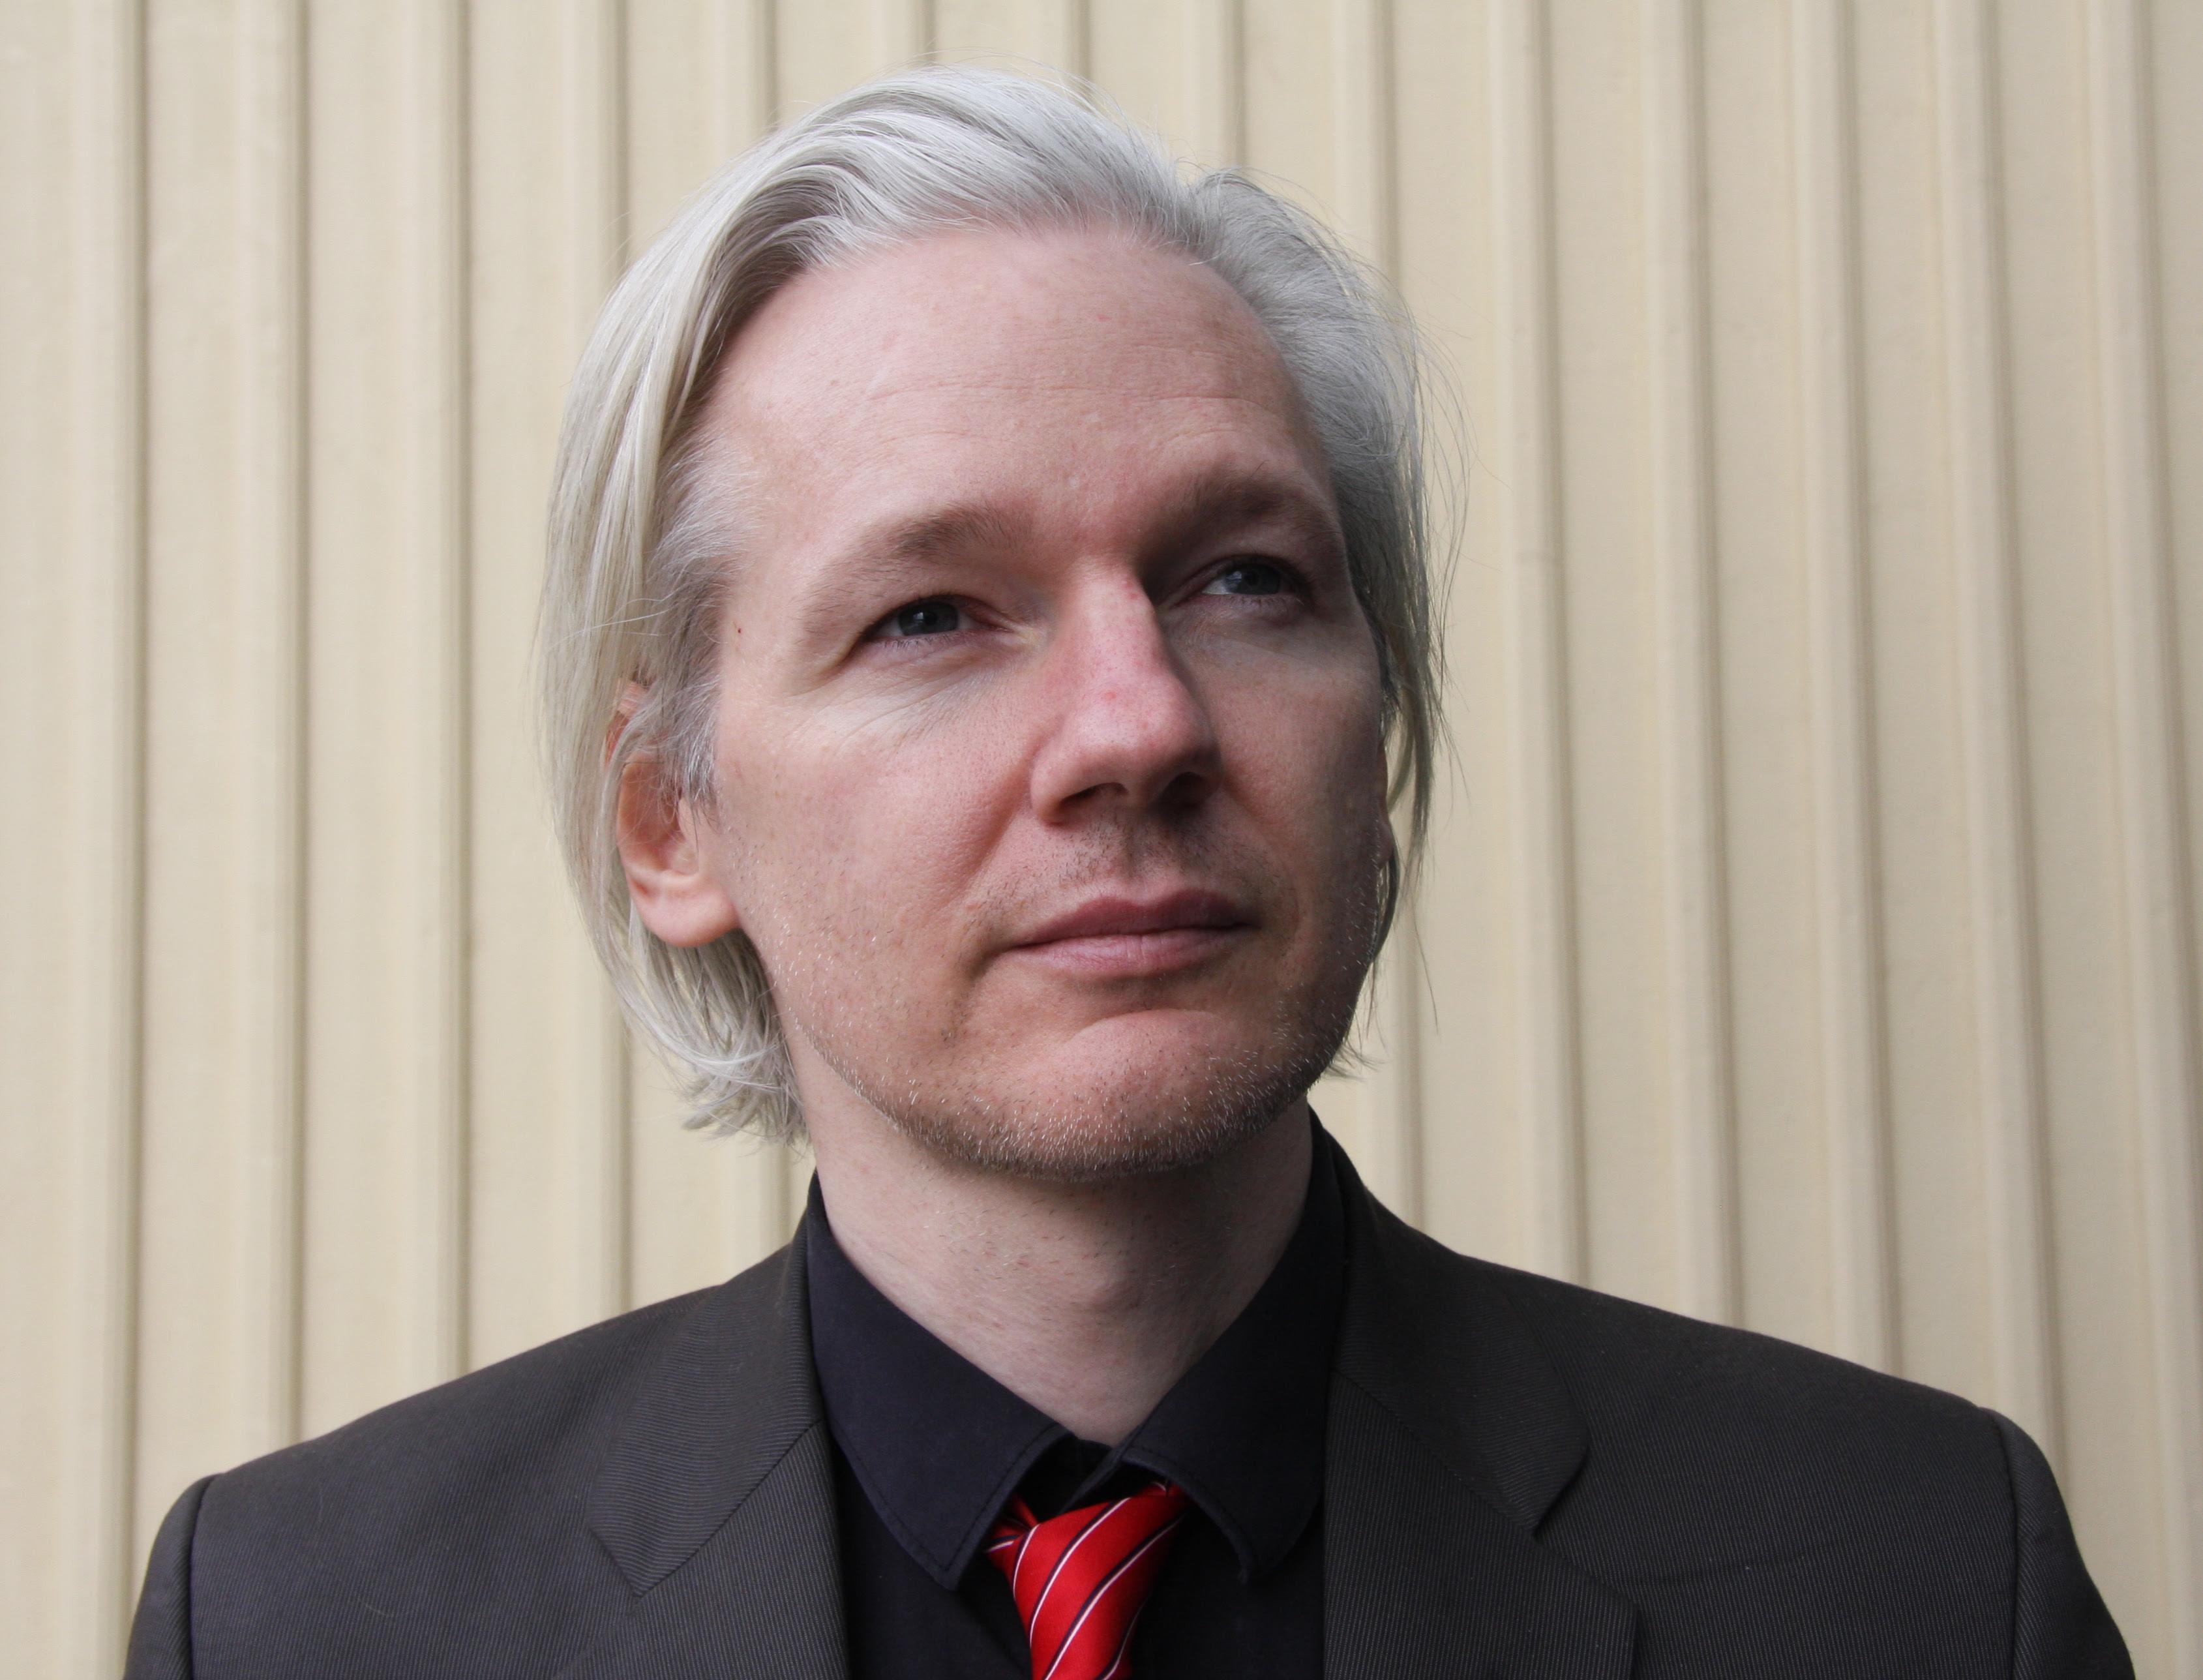 Mr. Julian Paul Assange